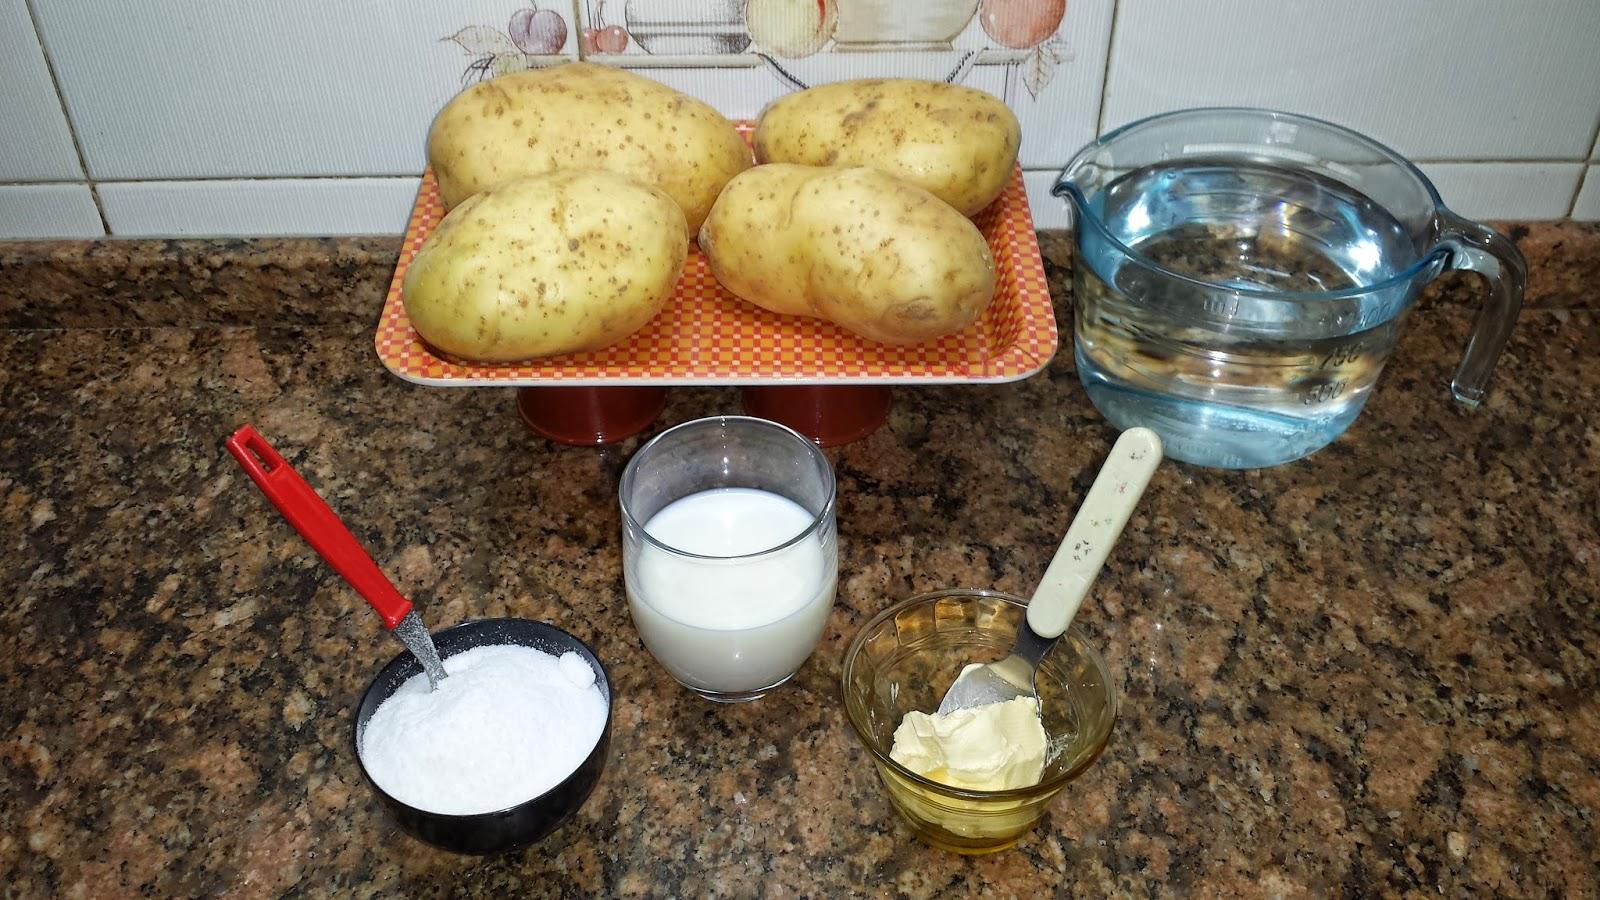 Pure de patata cremoso la cocina tradicional de cambalache3 for Cocina tradicional